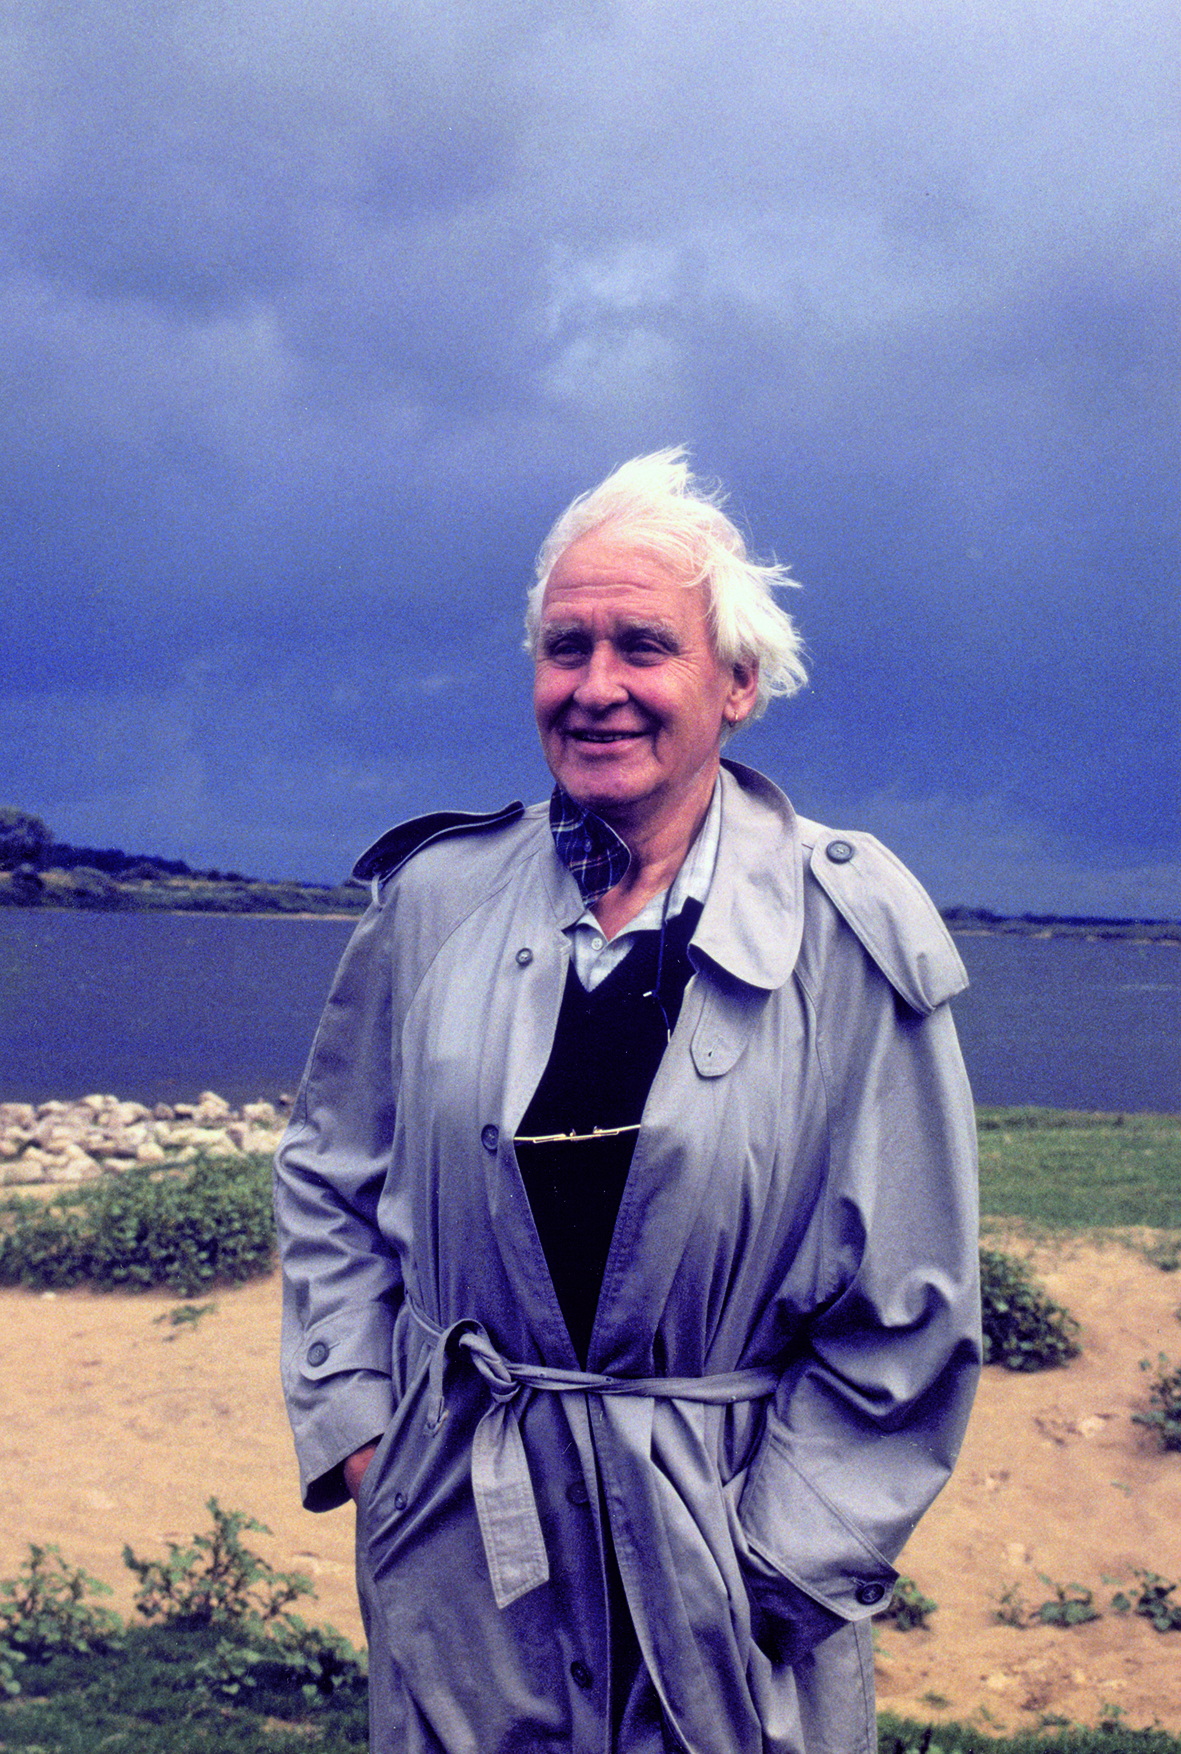 Gotthold Gloger am Ufer der Memel 1994 Foto von Thomas Plenert kl